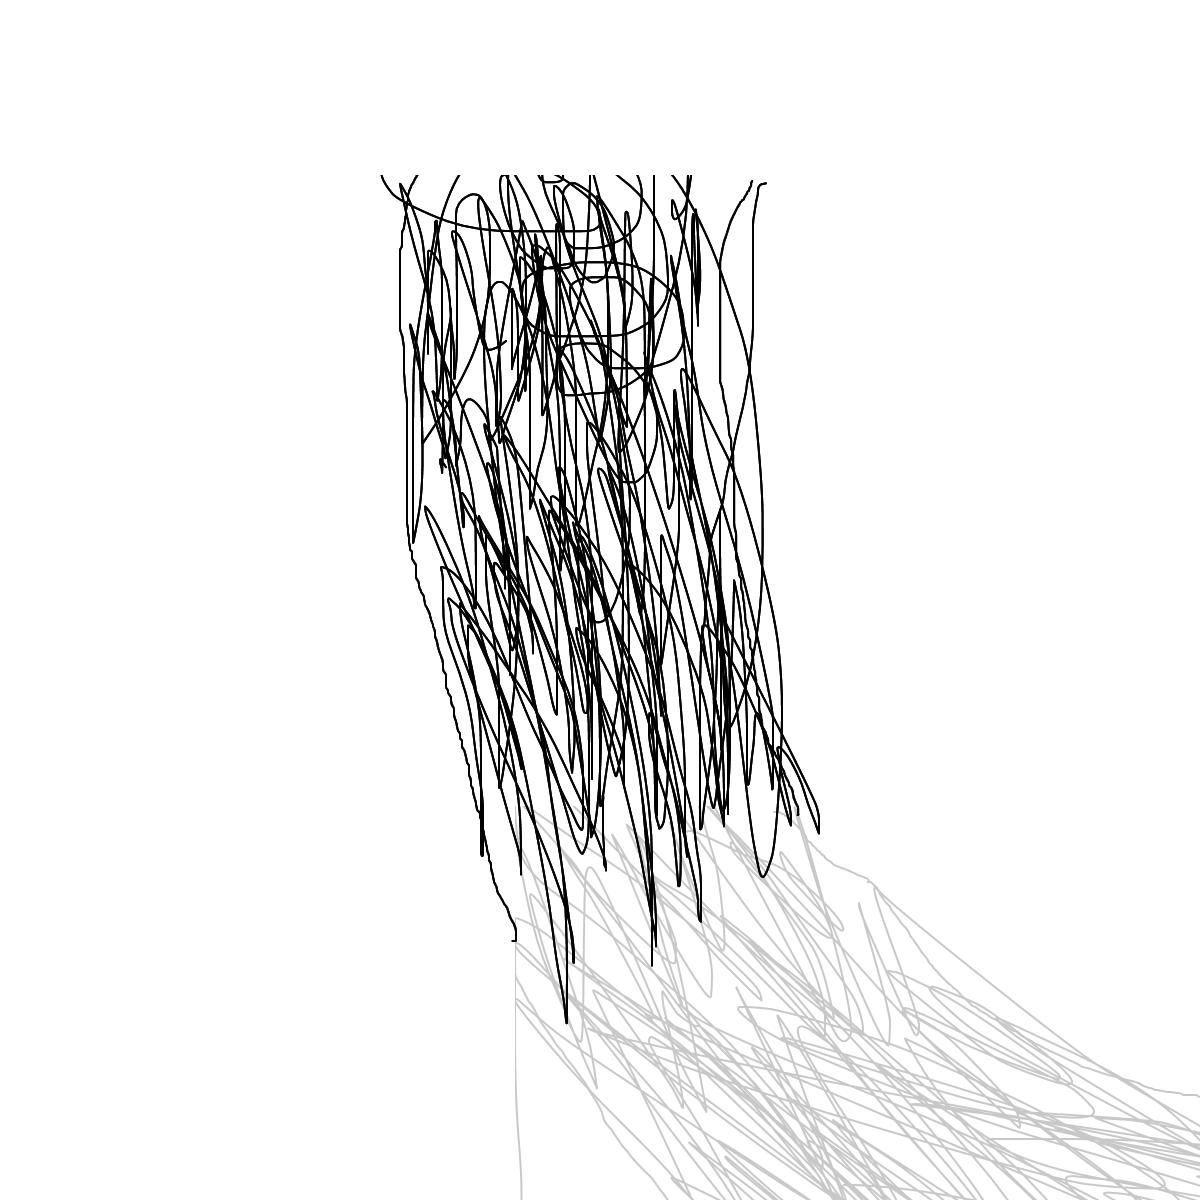 BAAAM drawing#11432 lat:52.4758644104003900lng: 13.4054956436157230